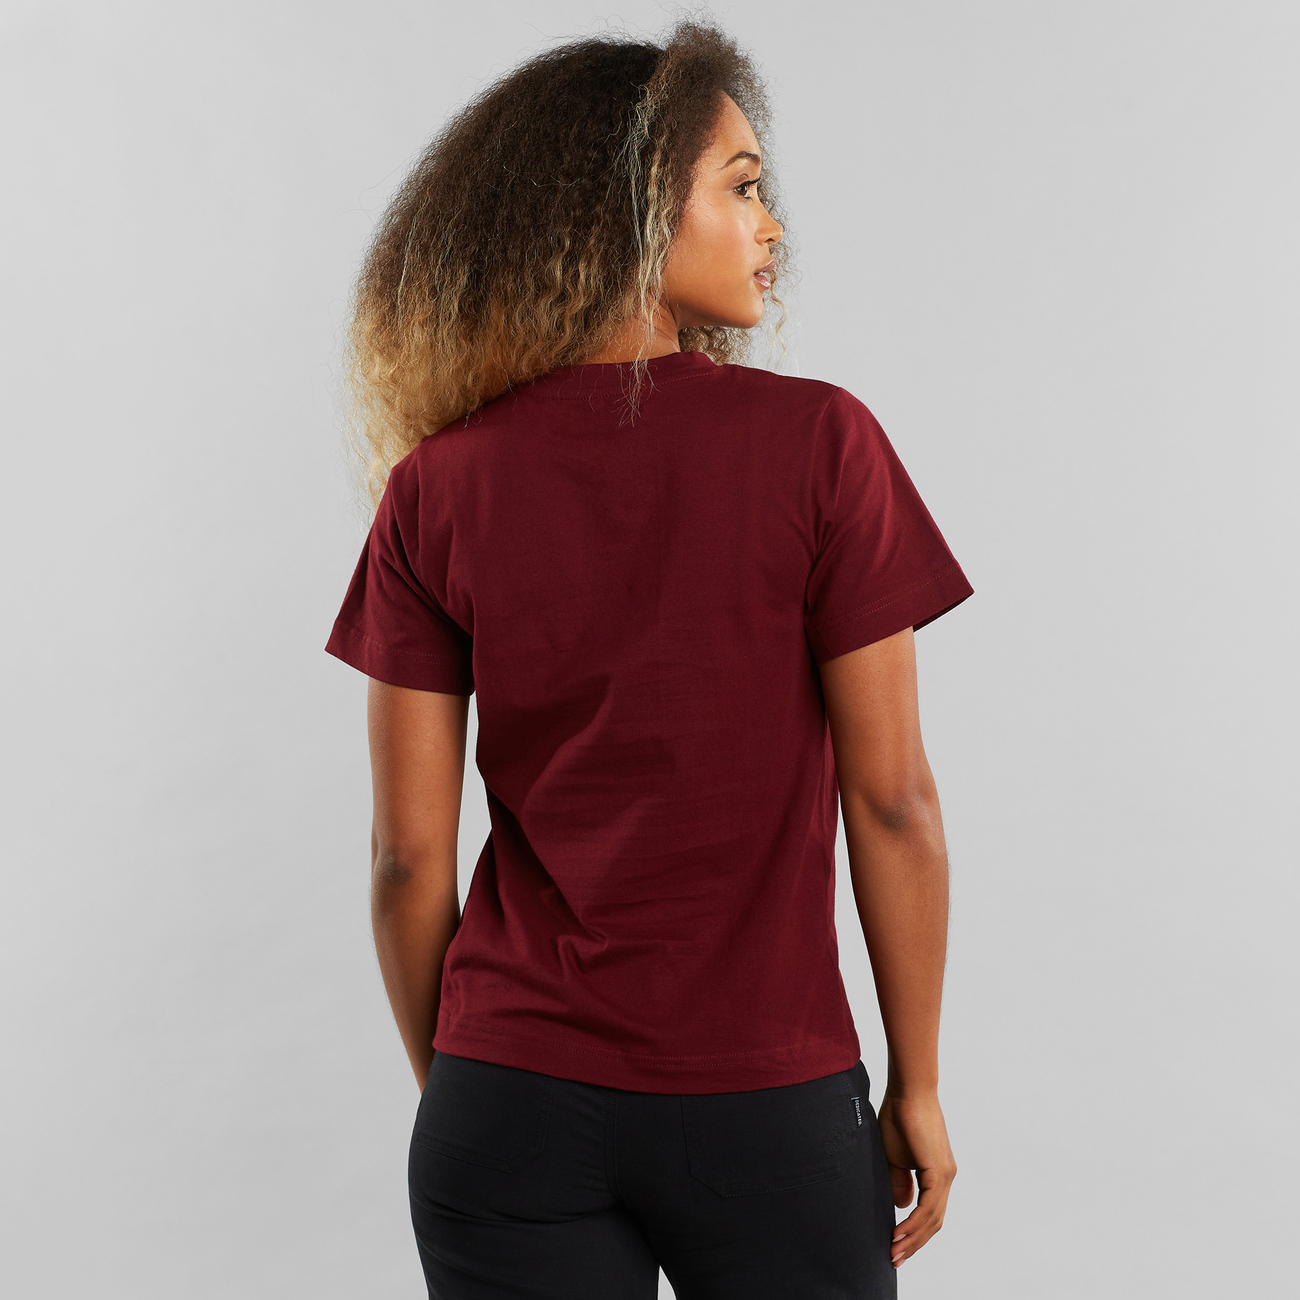 T-shirt Mysen Compromise Burgundy